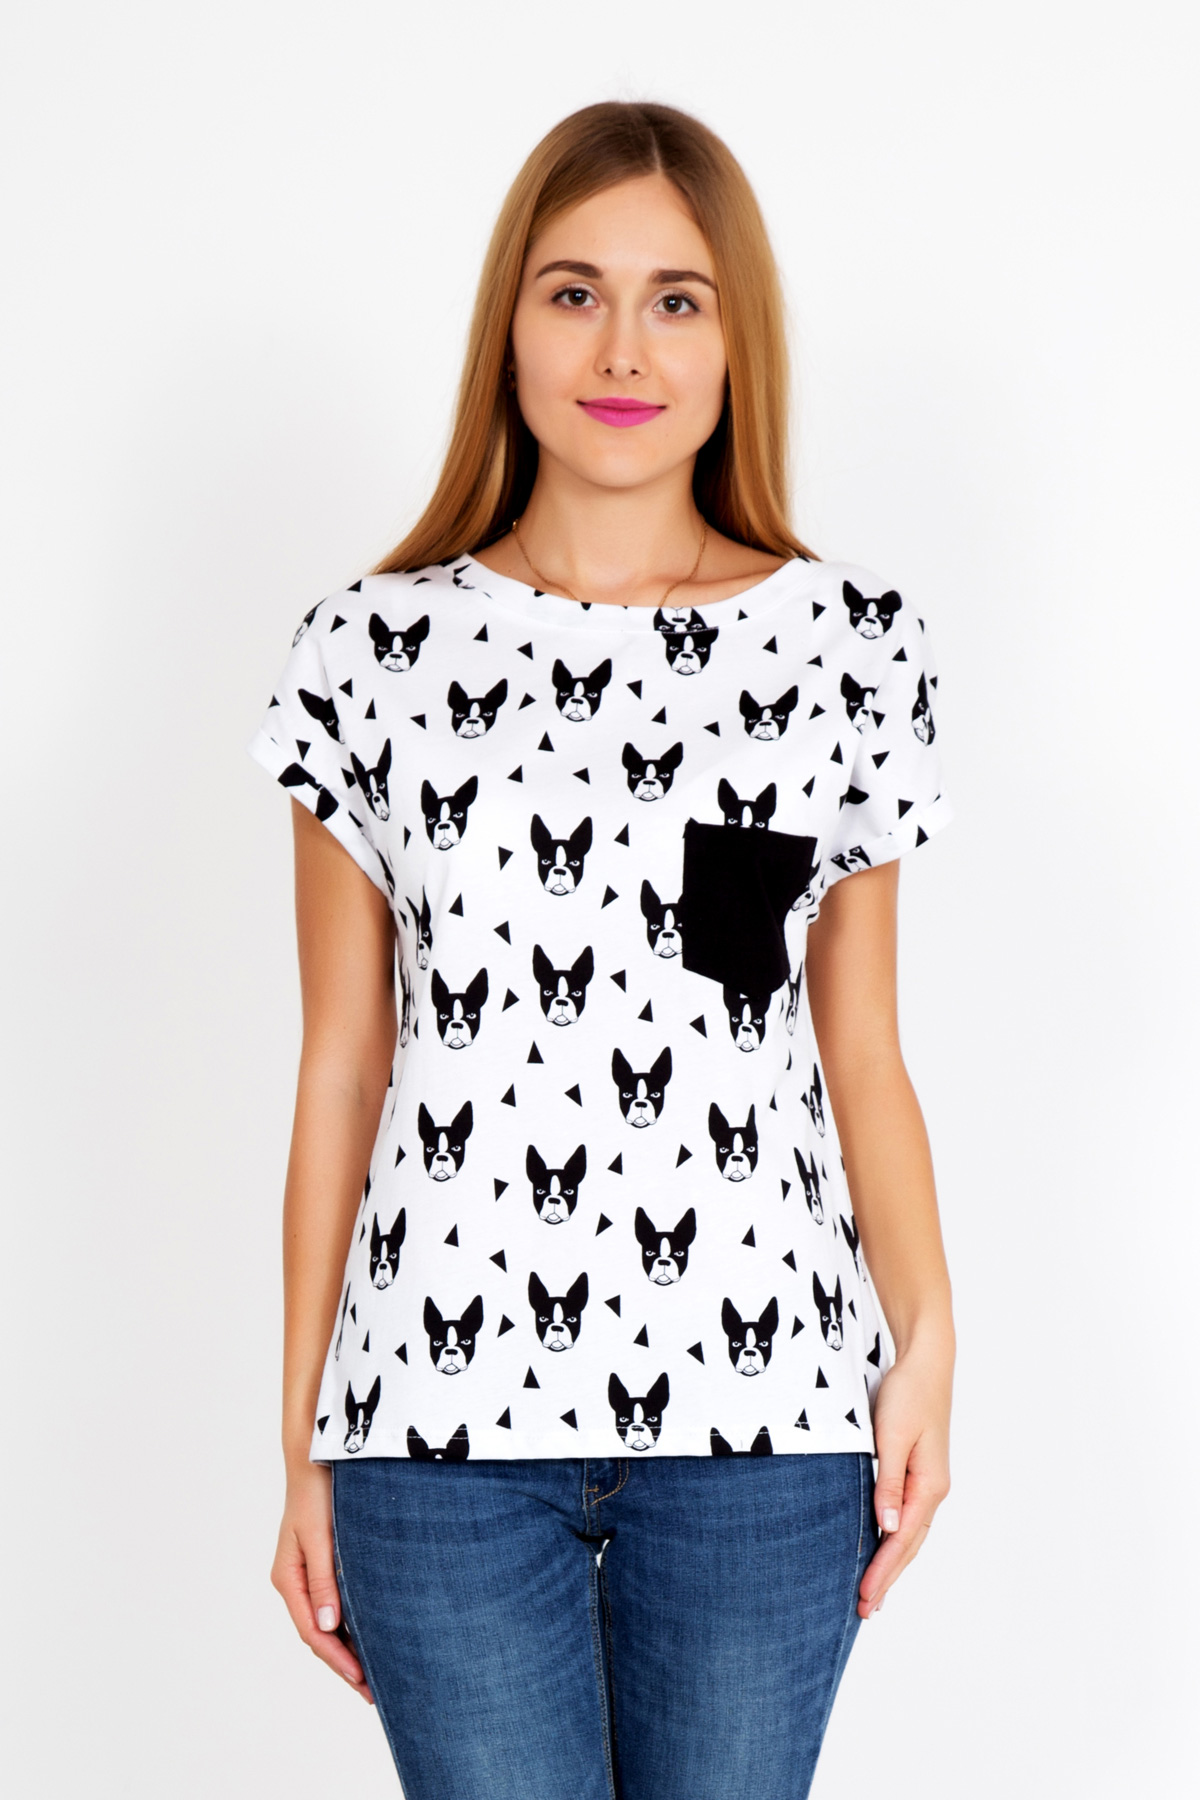 Жен. футболка Dog р. 54Майки и футболки<br>Факт. ОГ: 112 см <br>Факт. ОТ: 110 см <br>Факт. ОБ: 112 см <br>Длина по спинке: 64 см<br><br>Тип: Жен. футболка<br>Размер: 54<br>Материал: Кулирка